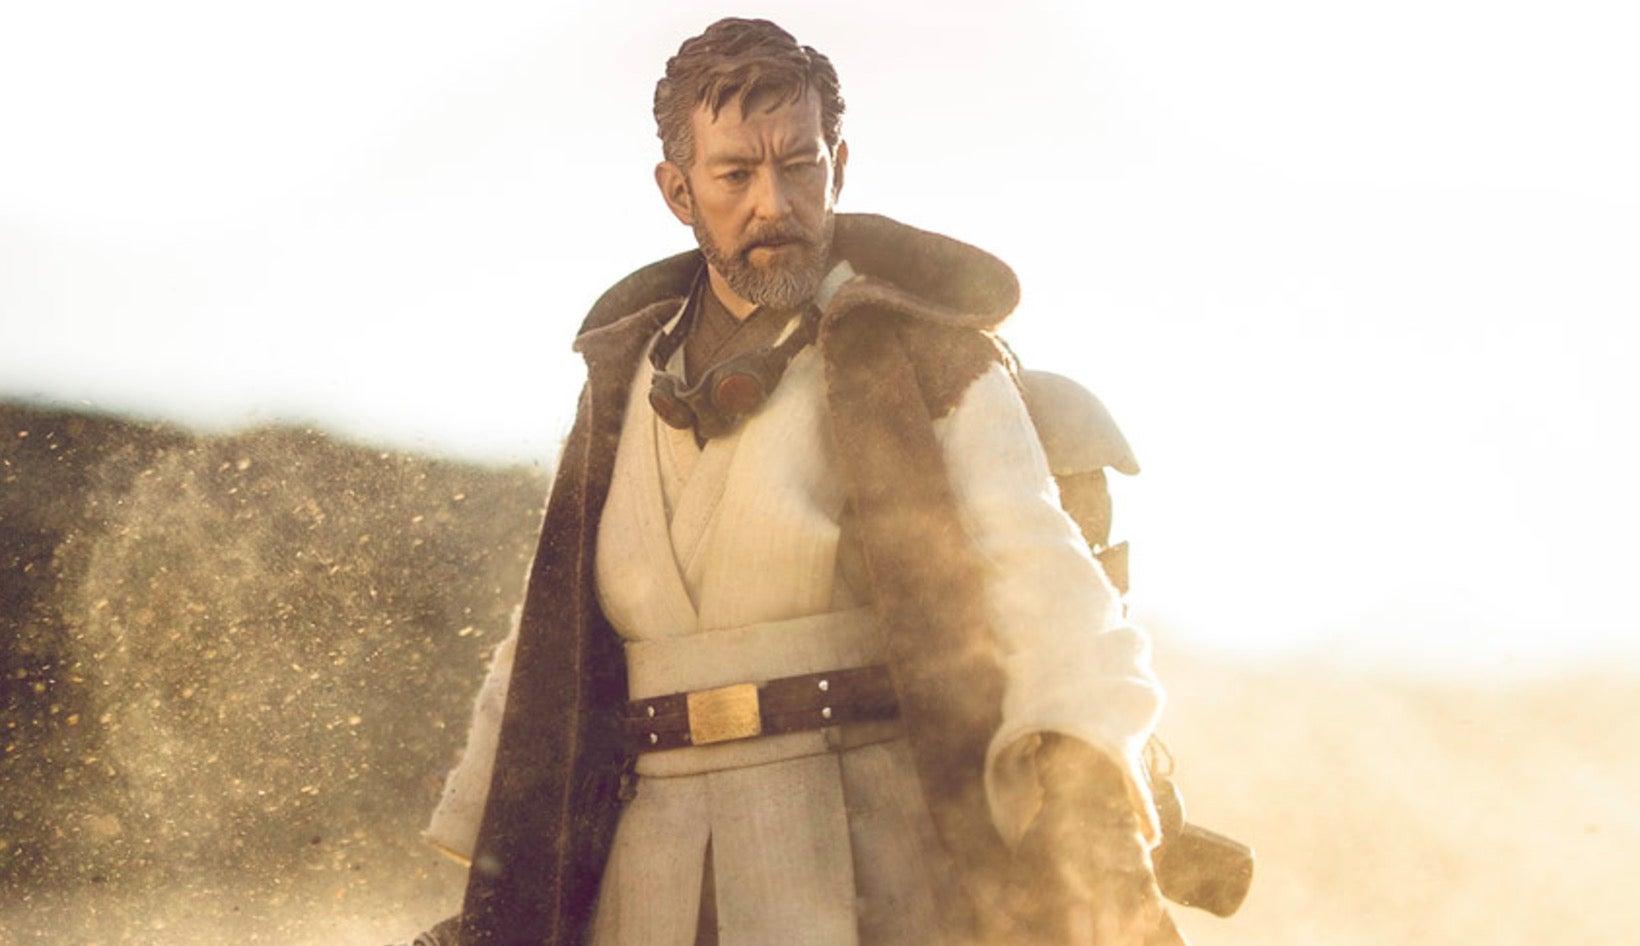 If An Obi-Wan Kenobi Movie Happens, He'll Probably Look Like This